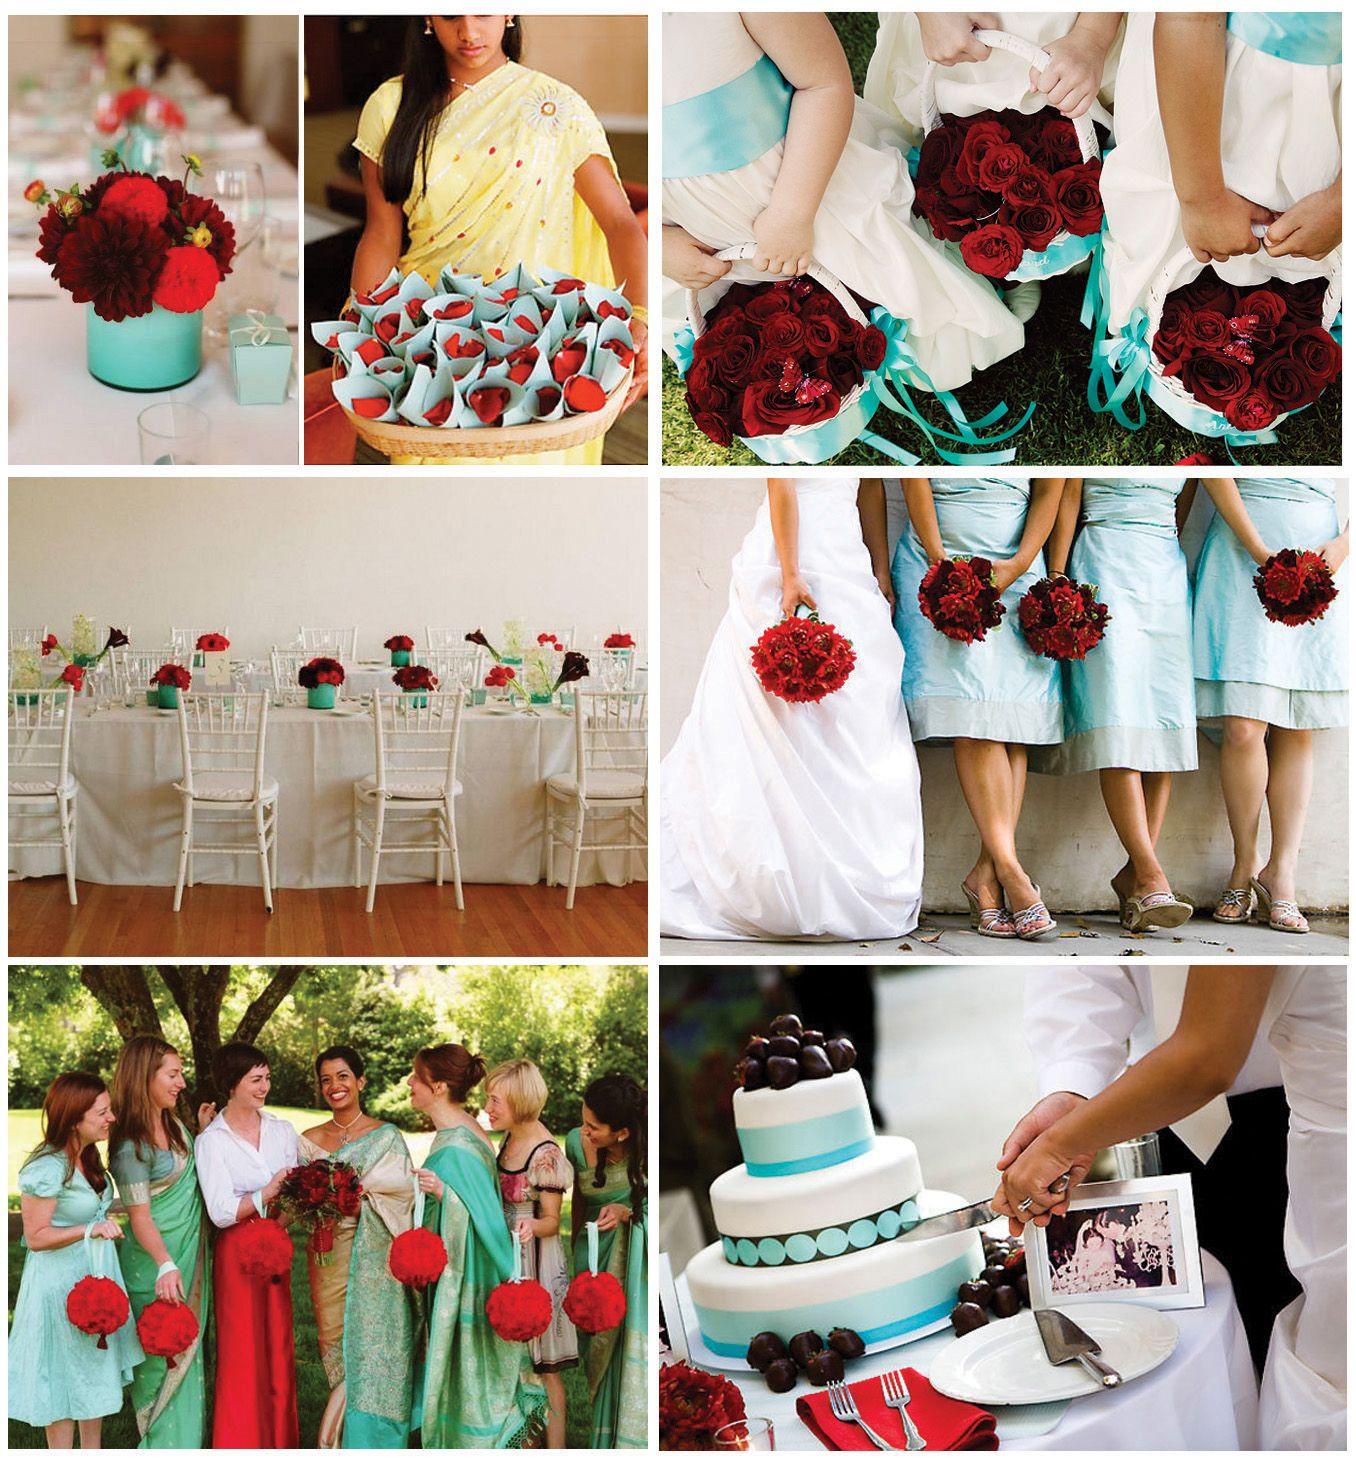 aqua and poppy   Aqua wedding colors, Weddings and Wedding